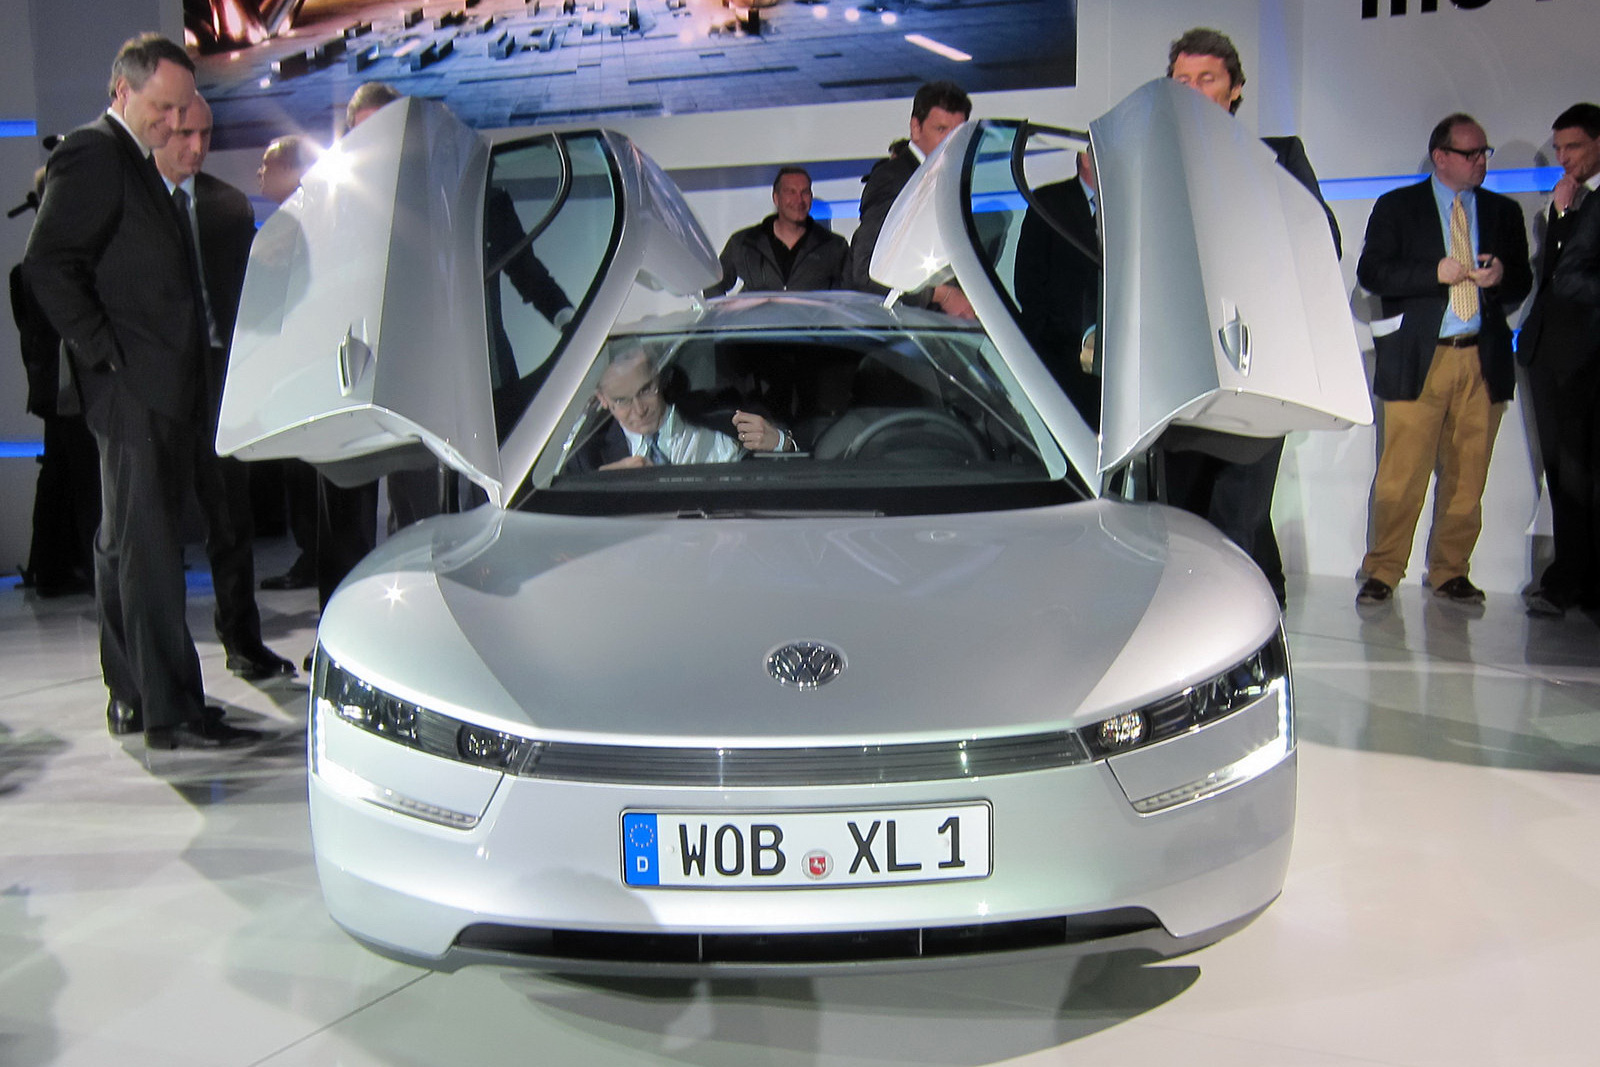 http://2.bp.blogspot.com/_66Xz44hEwsw/TUlNeYptJGI/AAAAAAAAAiA/Ku11PsCk9No/s1600/Volkswagen-XL1-Qatar-25.JPG